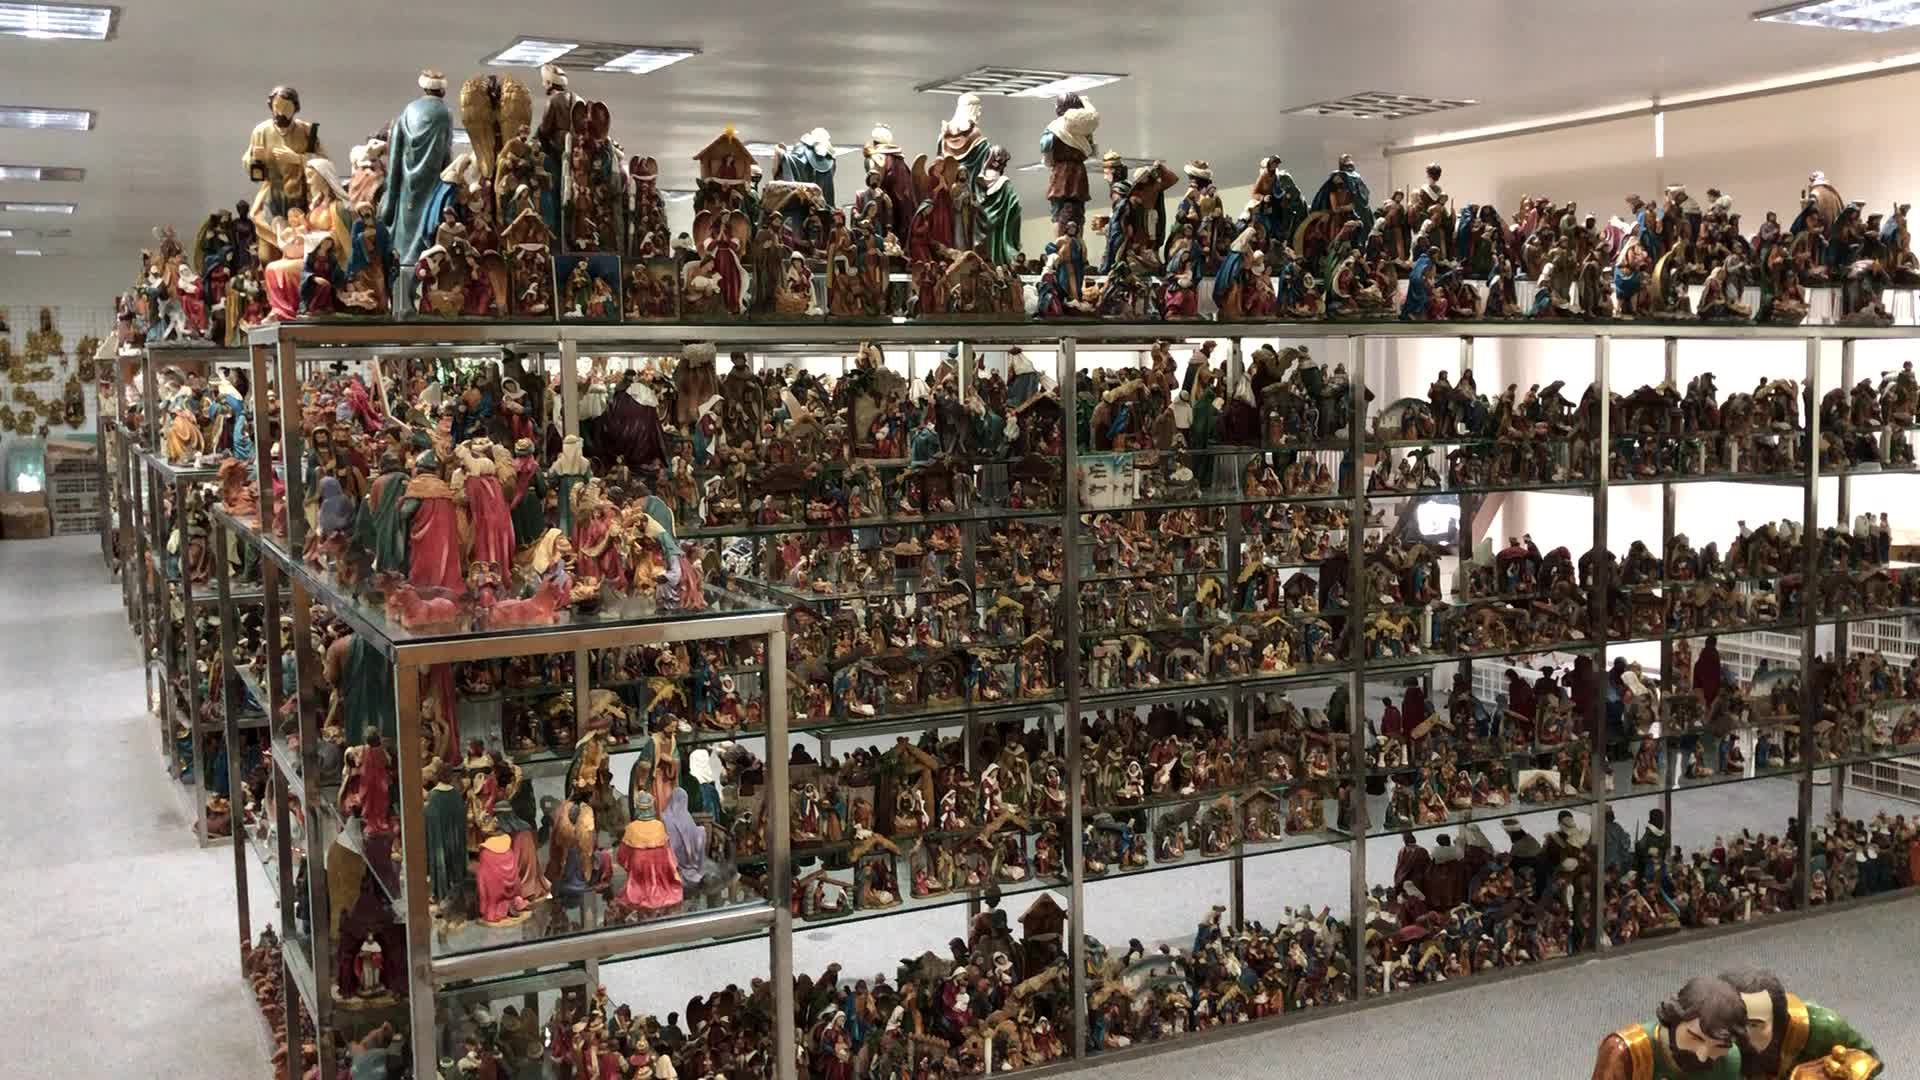 Conjunto de estatuetas de Natal Nativesity10-peça de Polyresin antigo, resina figurines de cena de natividade